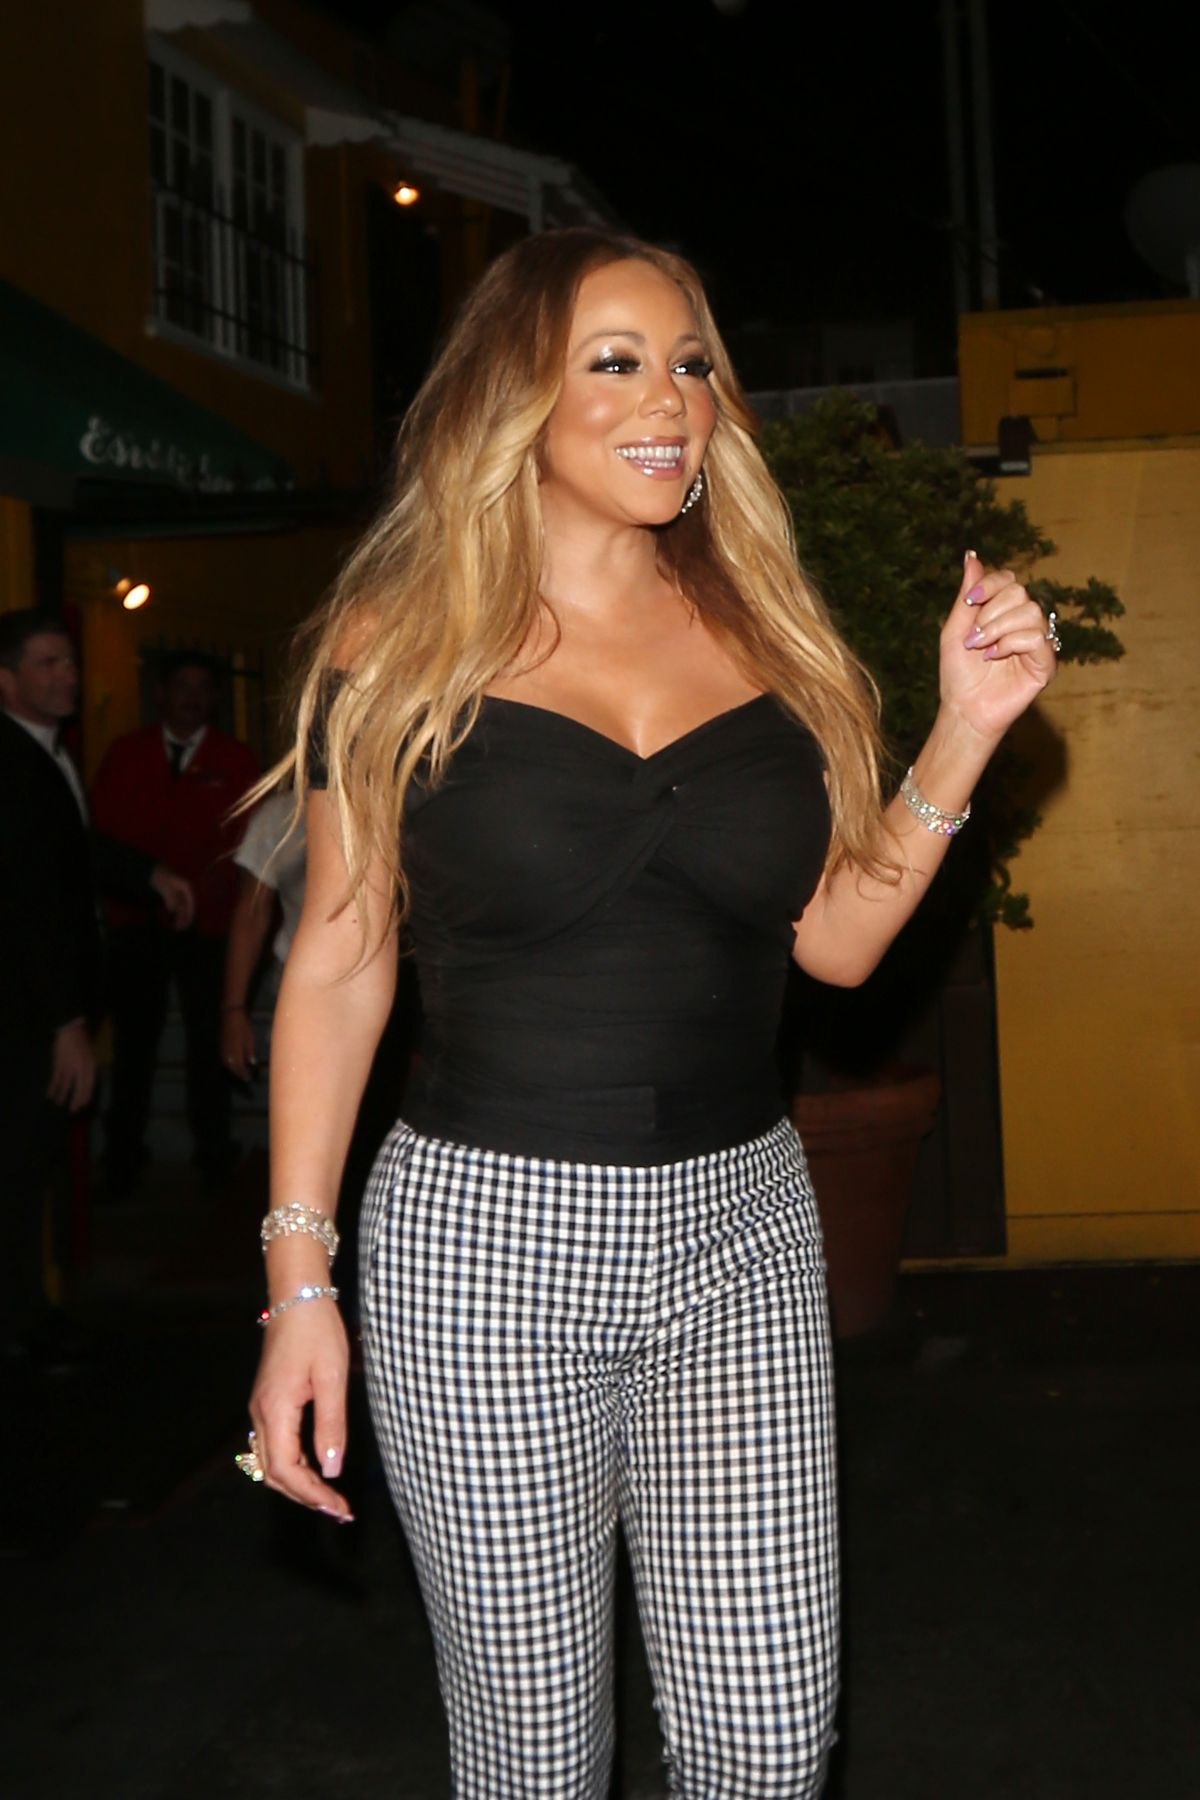 images 17. Mariah Carey